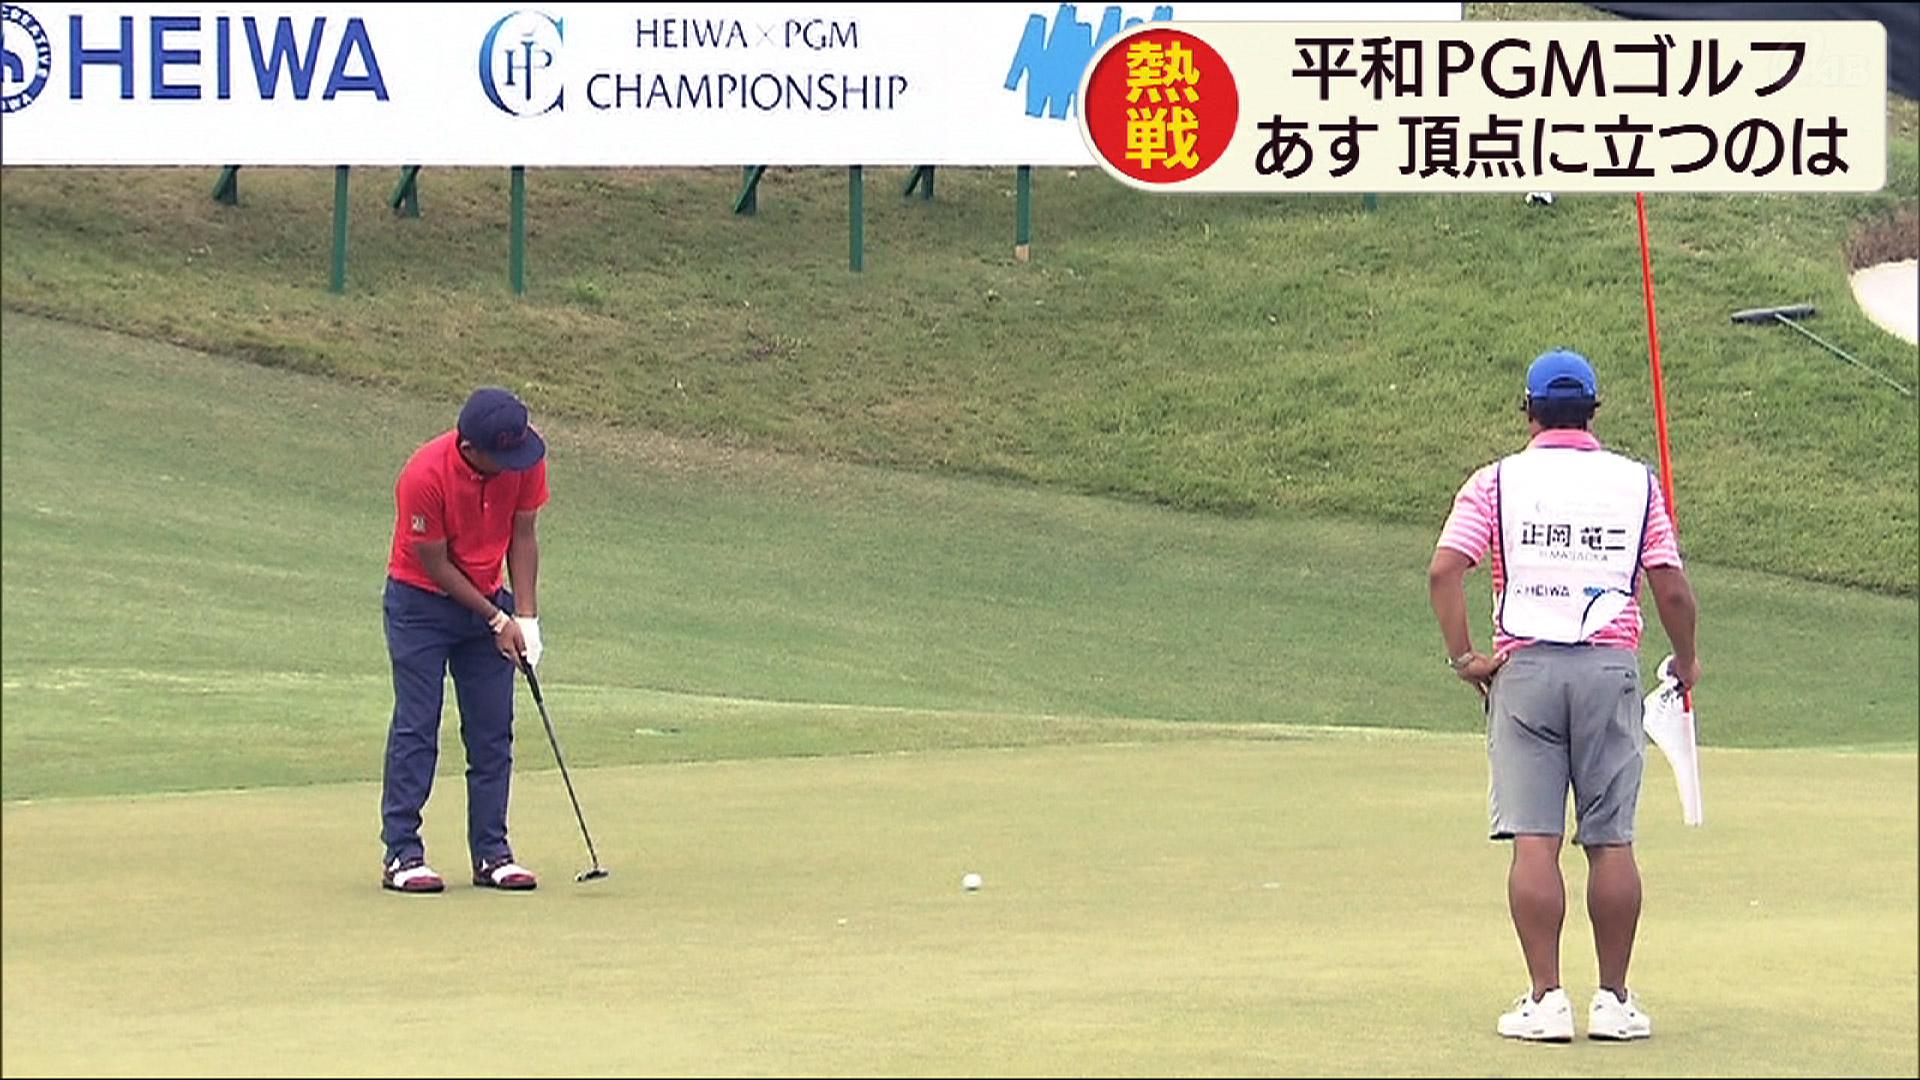 HEIWA・PGM CHAMPIONSHIP 決勝ラウンド